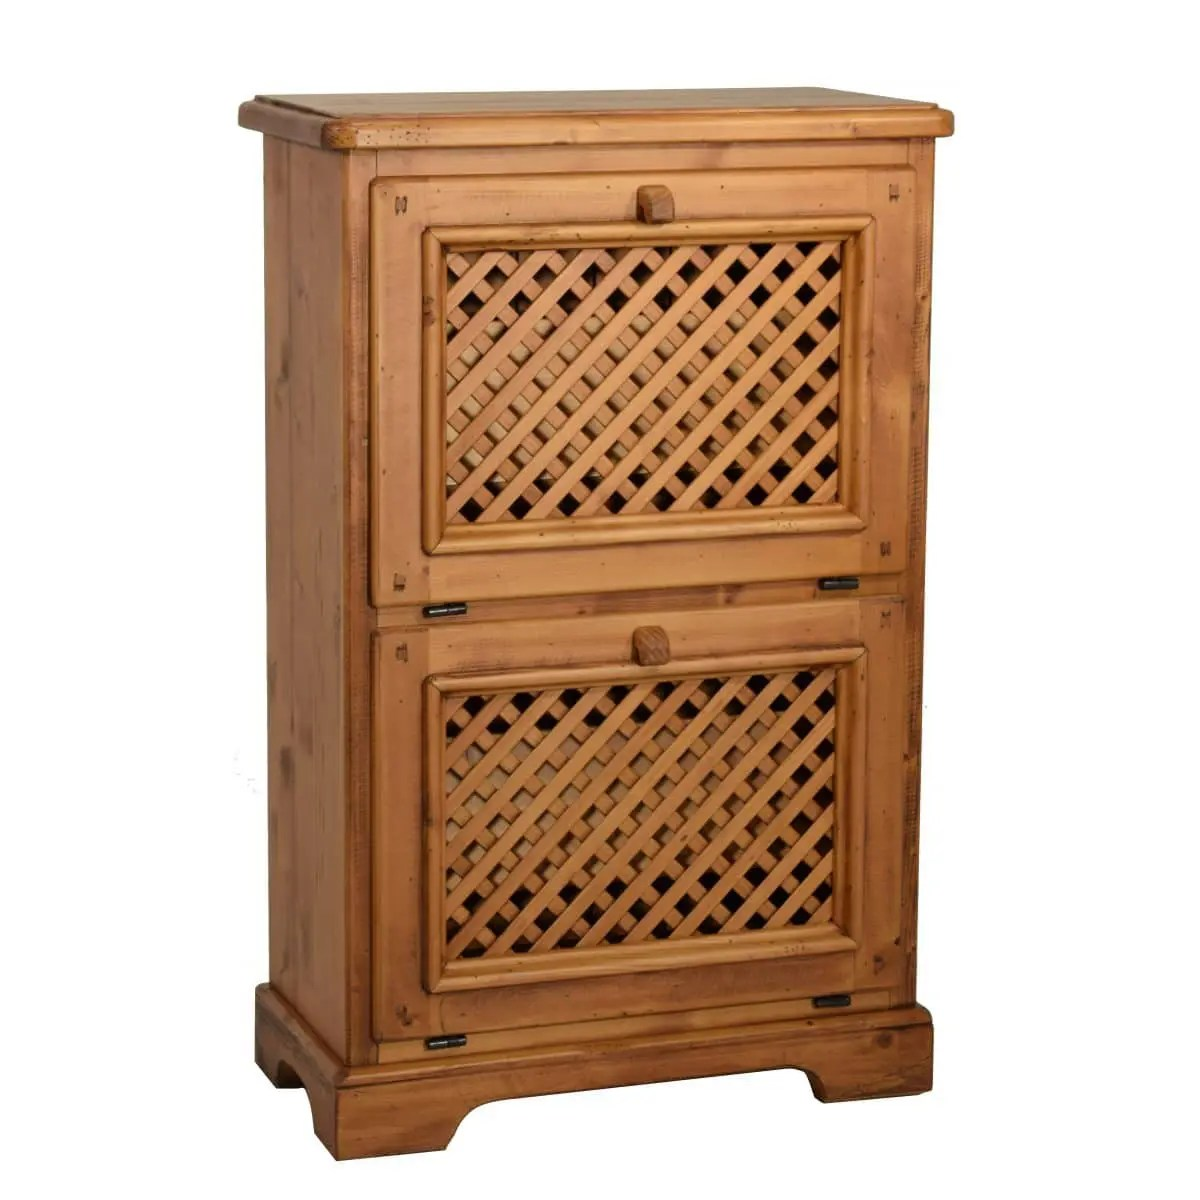 Zapatero rstico de madera Ecorstico venta de muebles